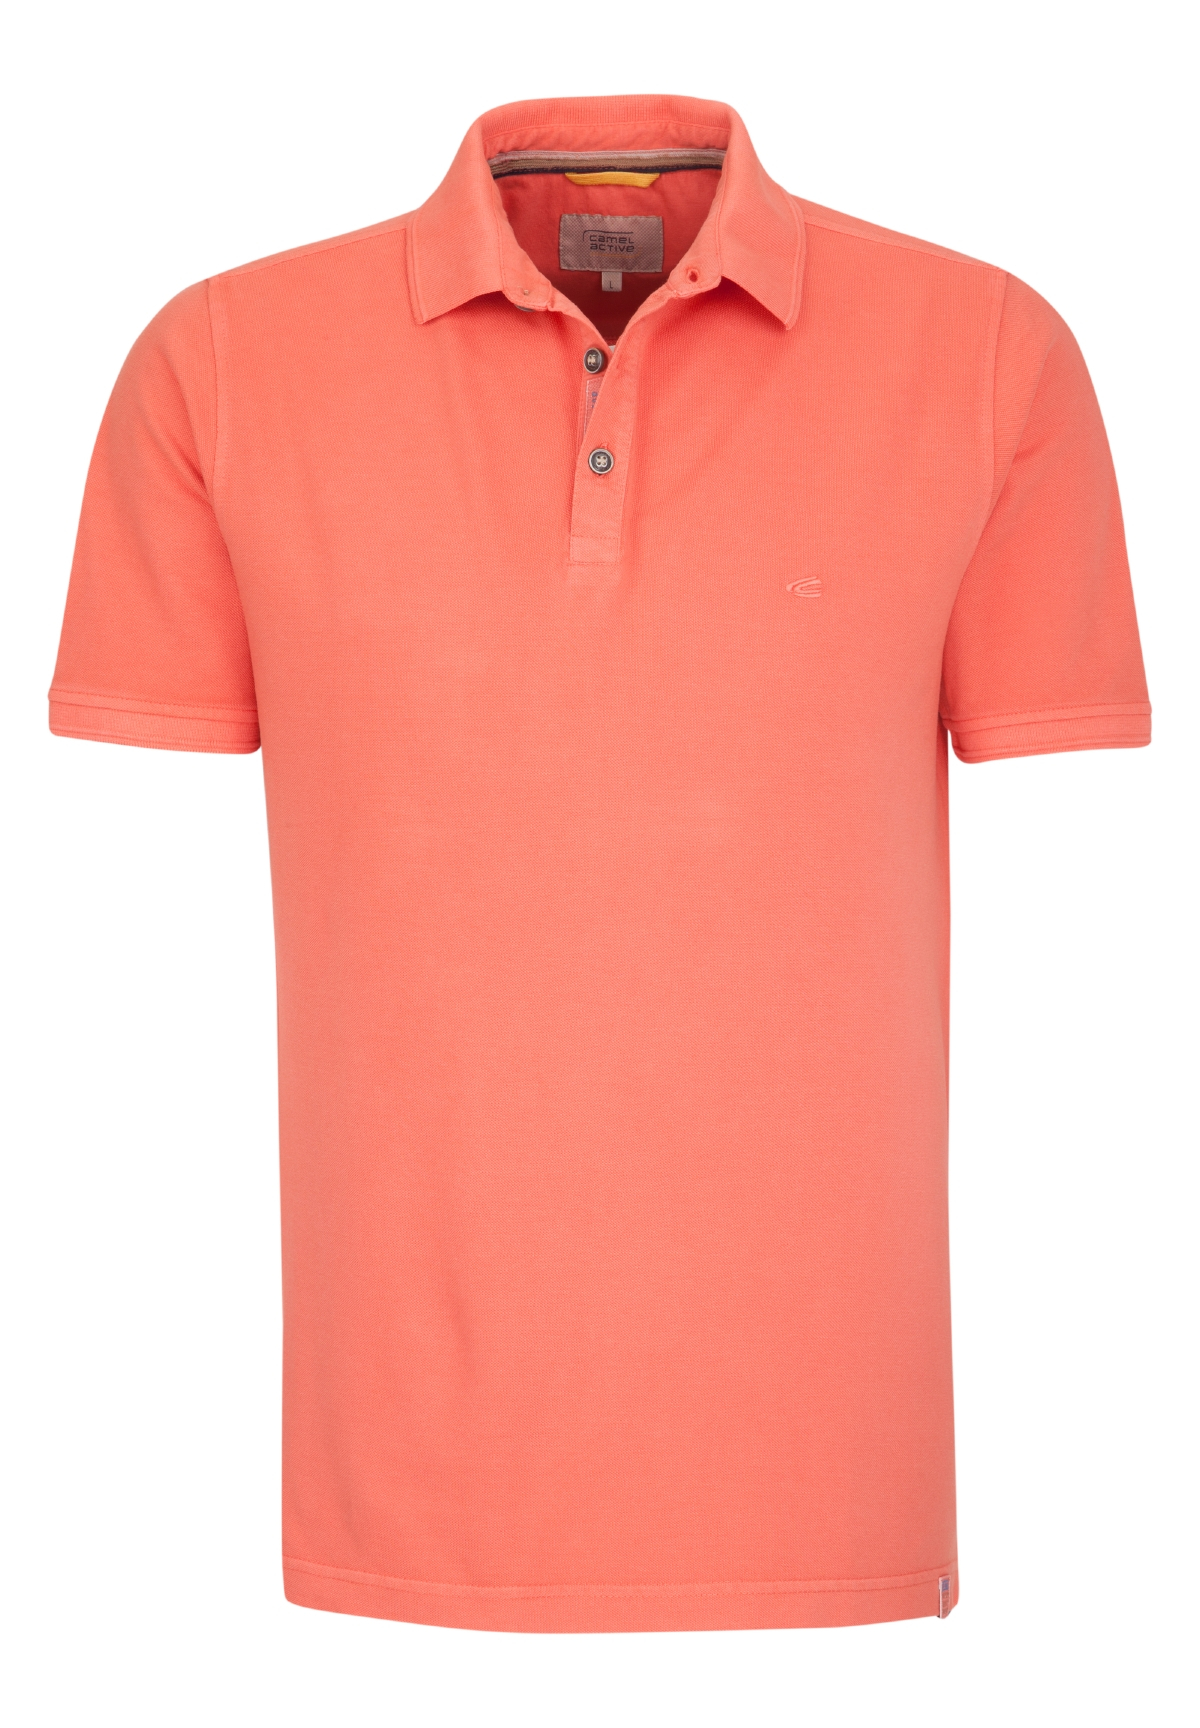 Camel-Active-Herren-Shirt-Poloshirt-Pique-Regular-Fit-NEU Indexbild 62